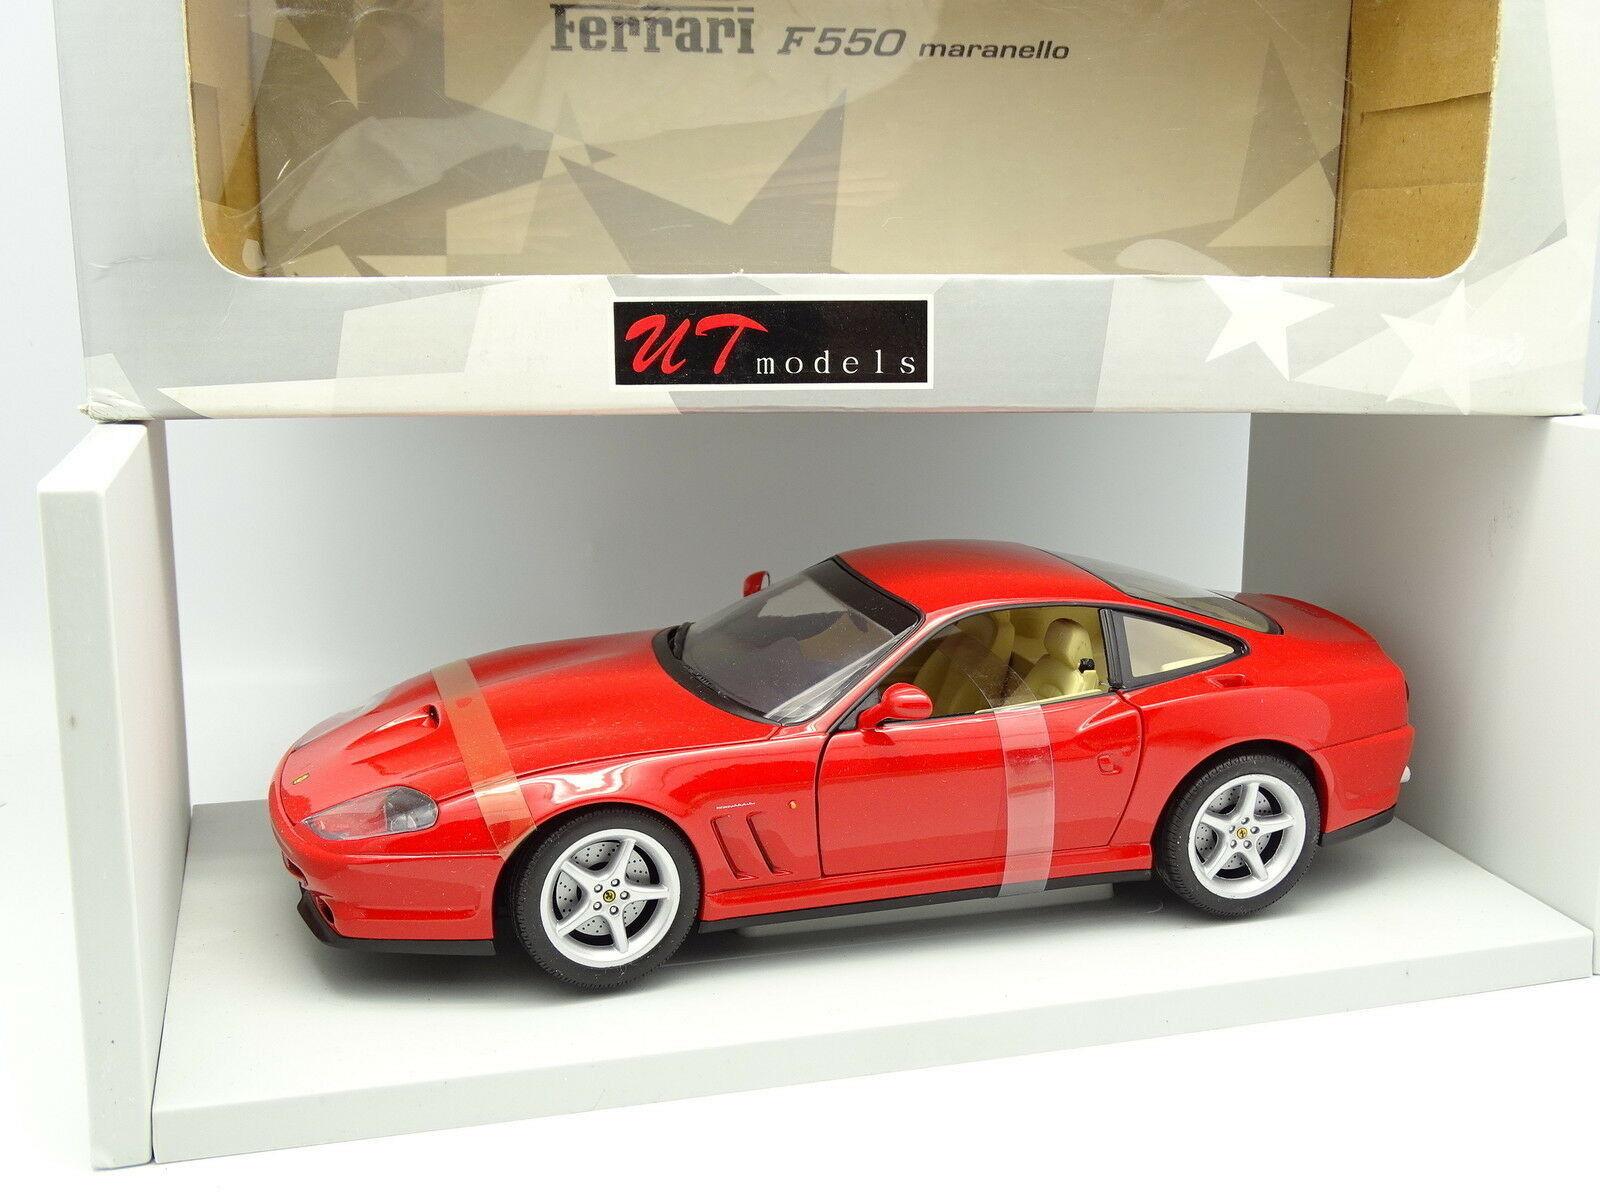 UT Models 1 18 - Ferrari F550 Maranello Rouge